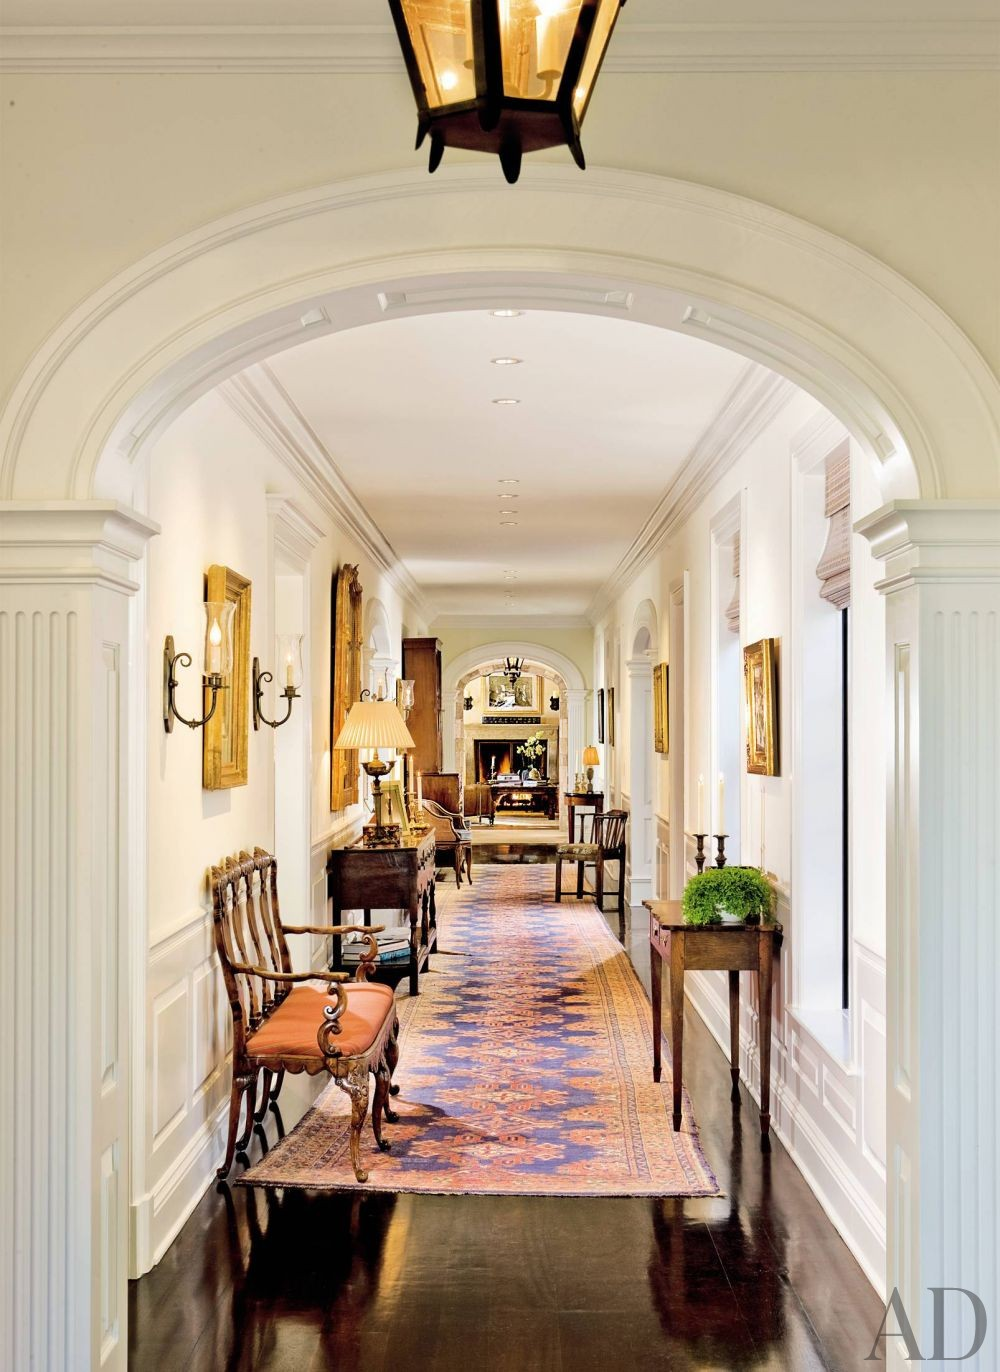 Traditional Staircase/Hallway by Lane-McCook & Associates and Appleton & Associates in Santa Barbara, California